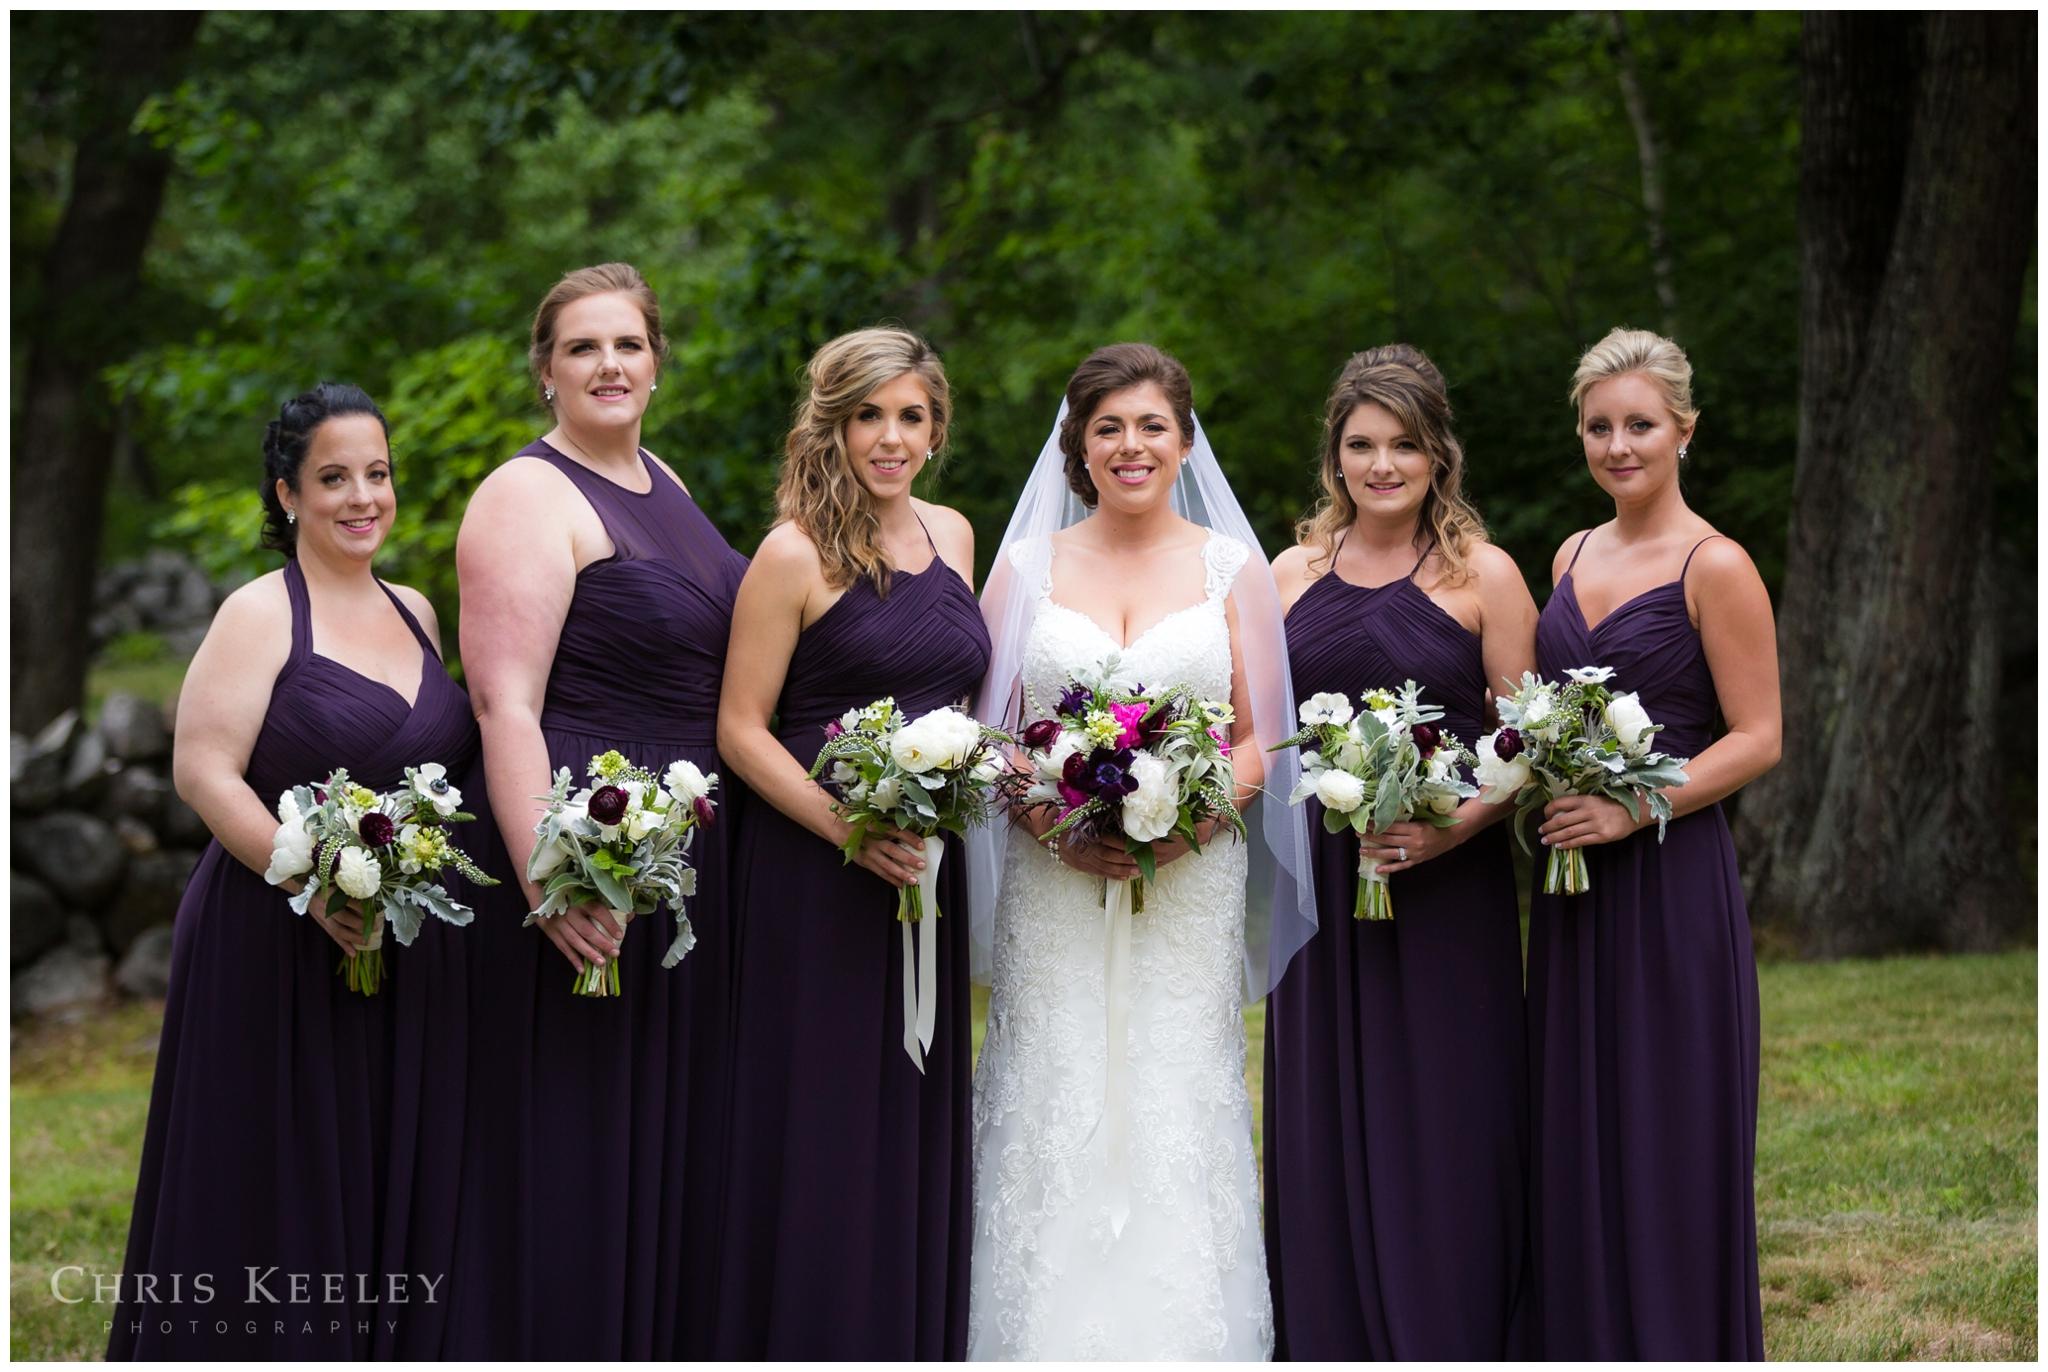 burrows-new-hampshire-wedding-photographer-chris-keeley-12.jpg